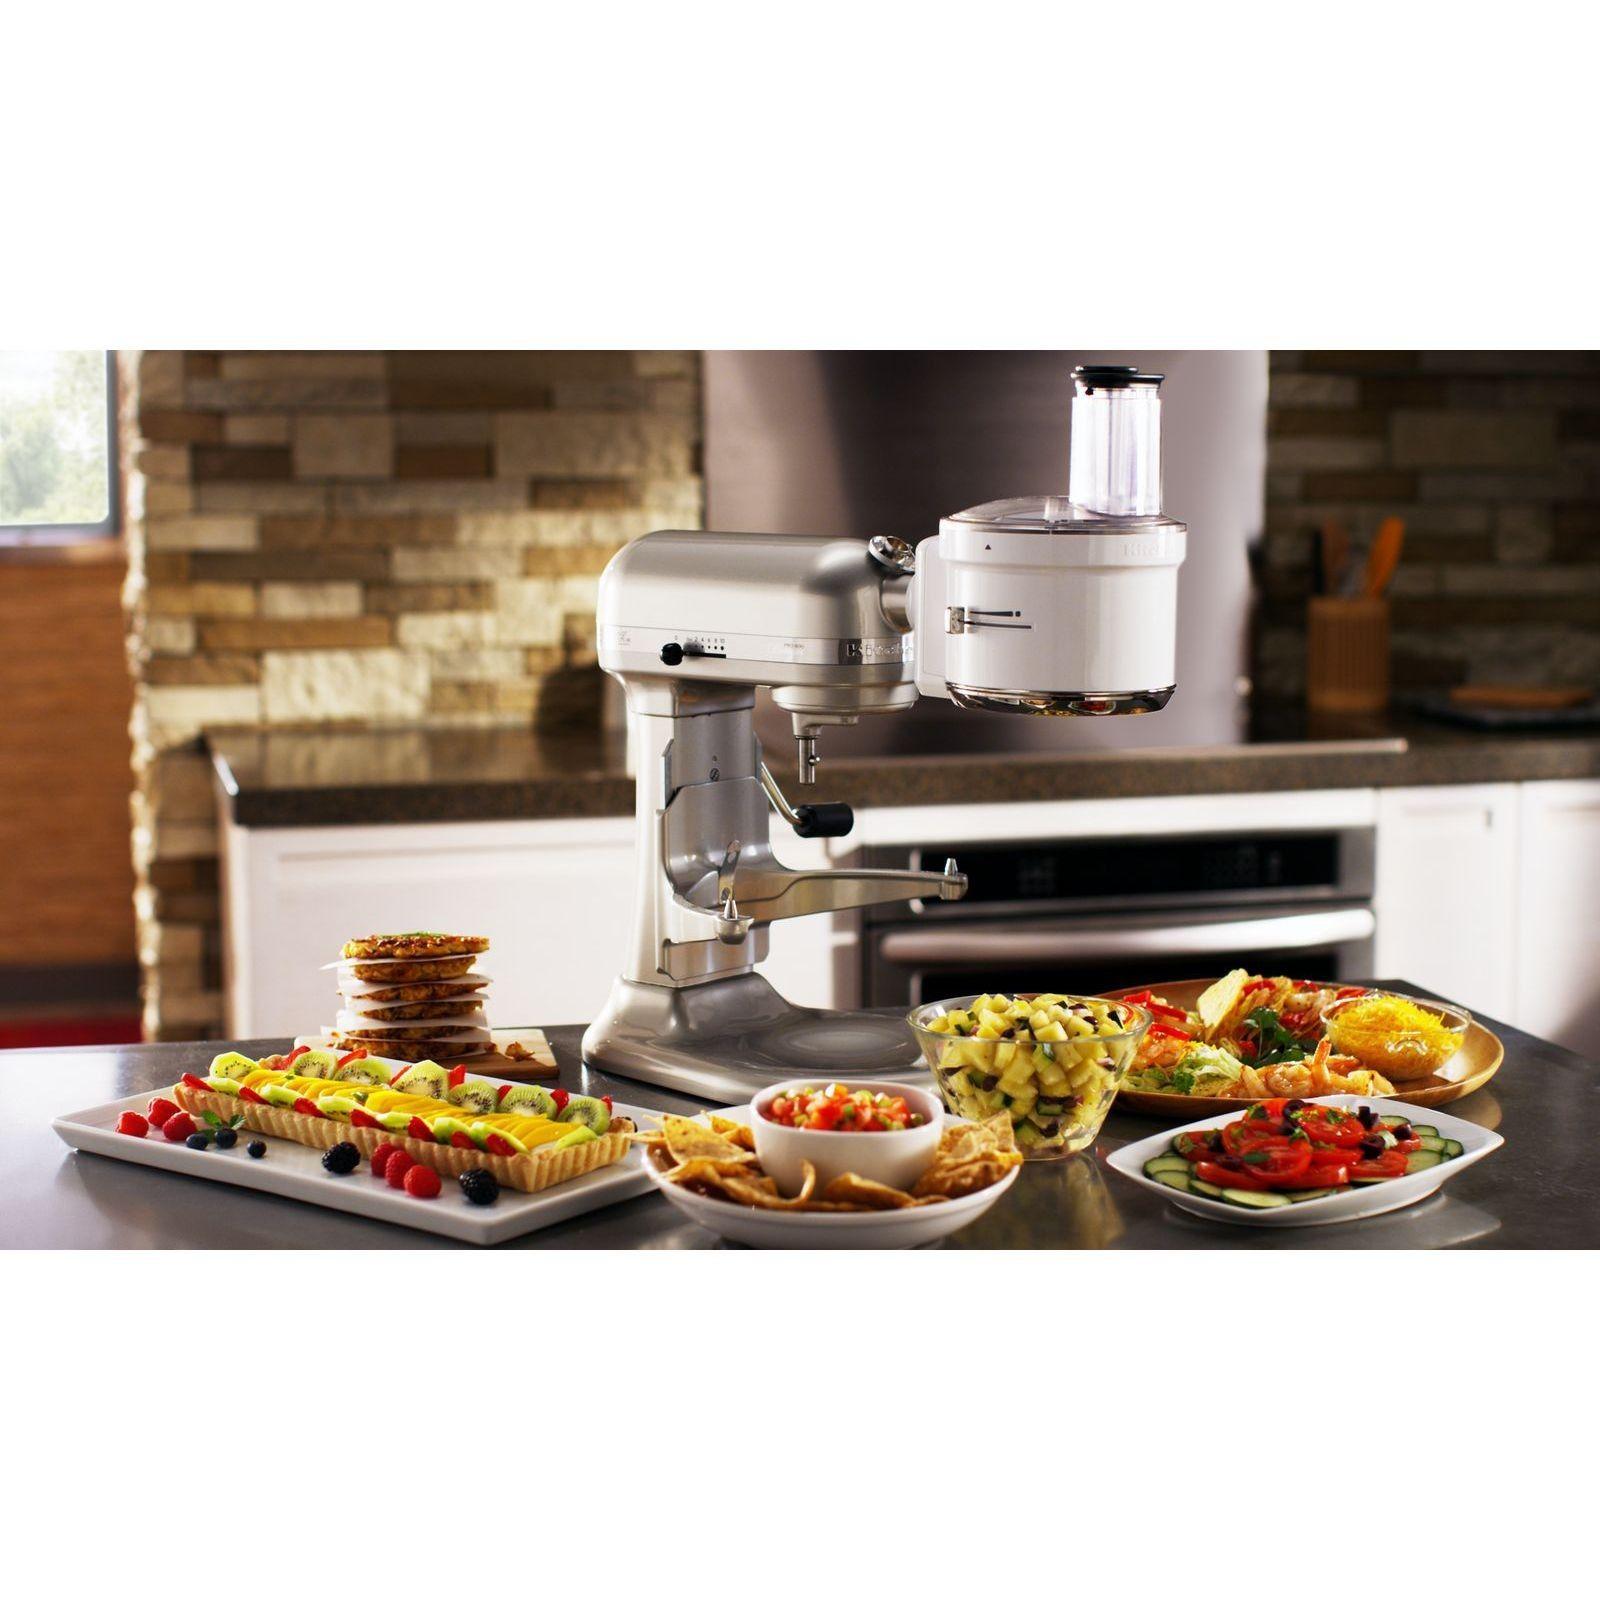 Kitchenaid exactslice food processor attachment fits all